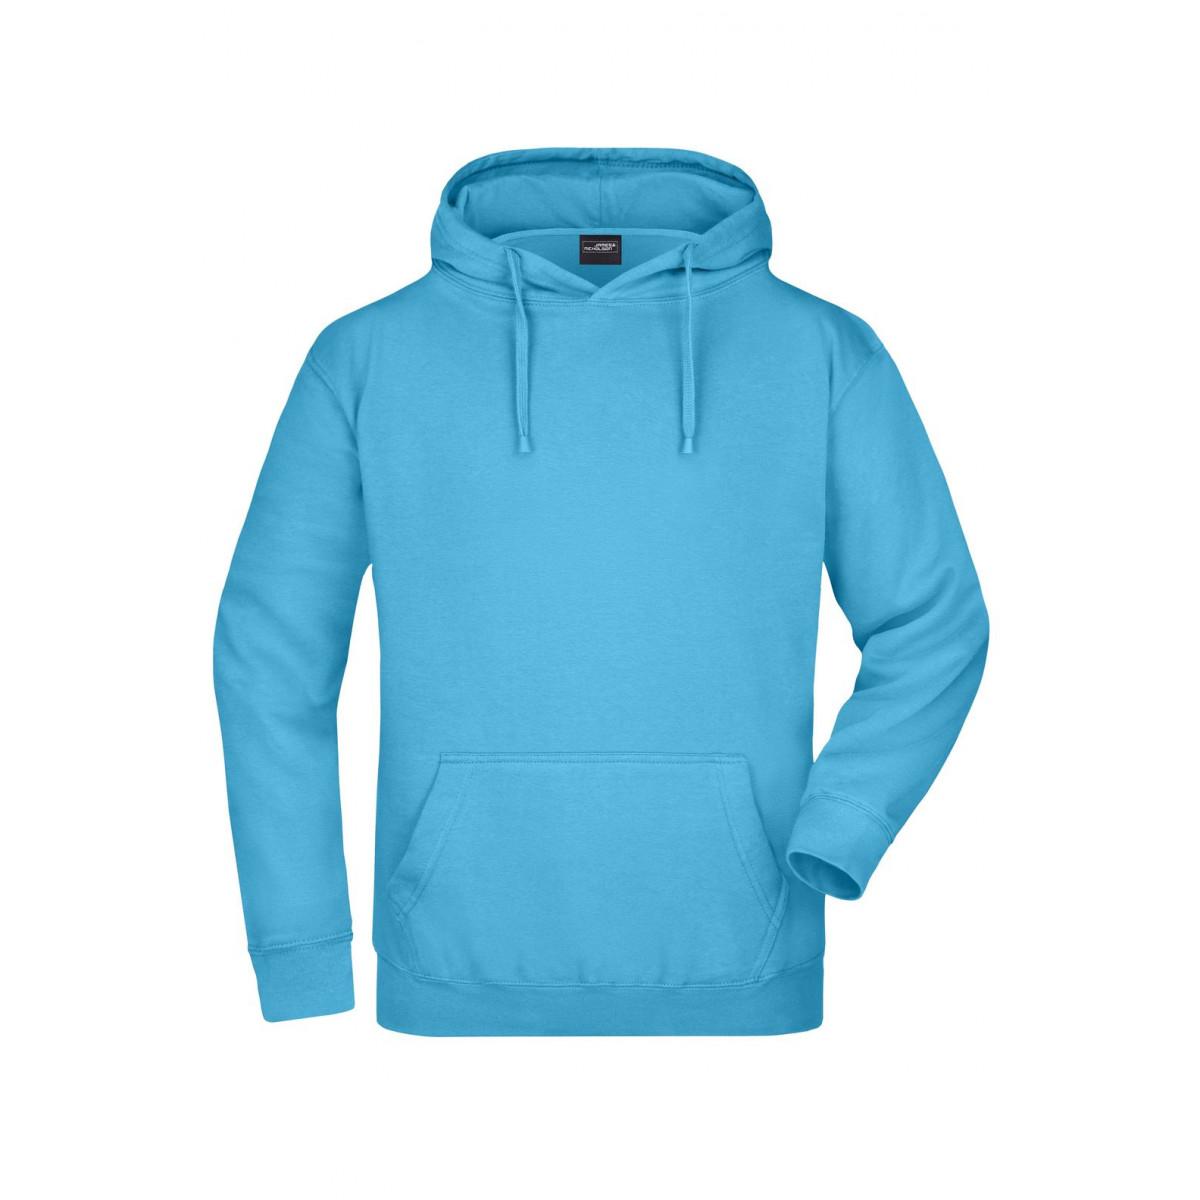 Толстовка мужская JN047 Hooded Sweat - Небесно-голубой